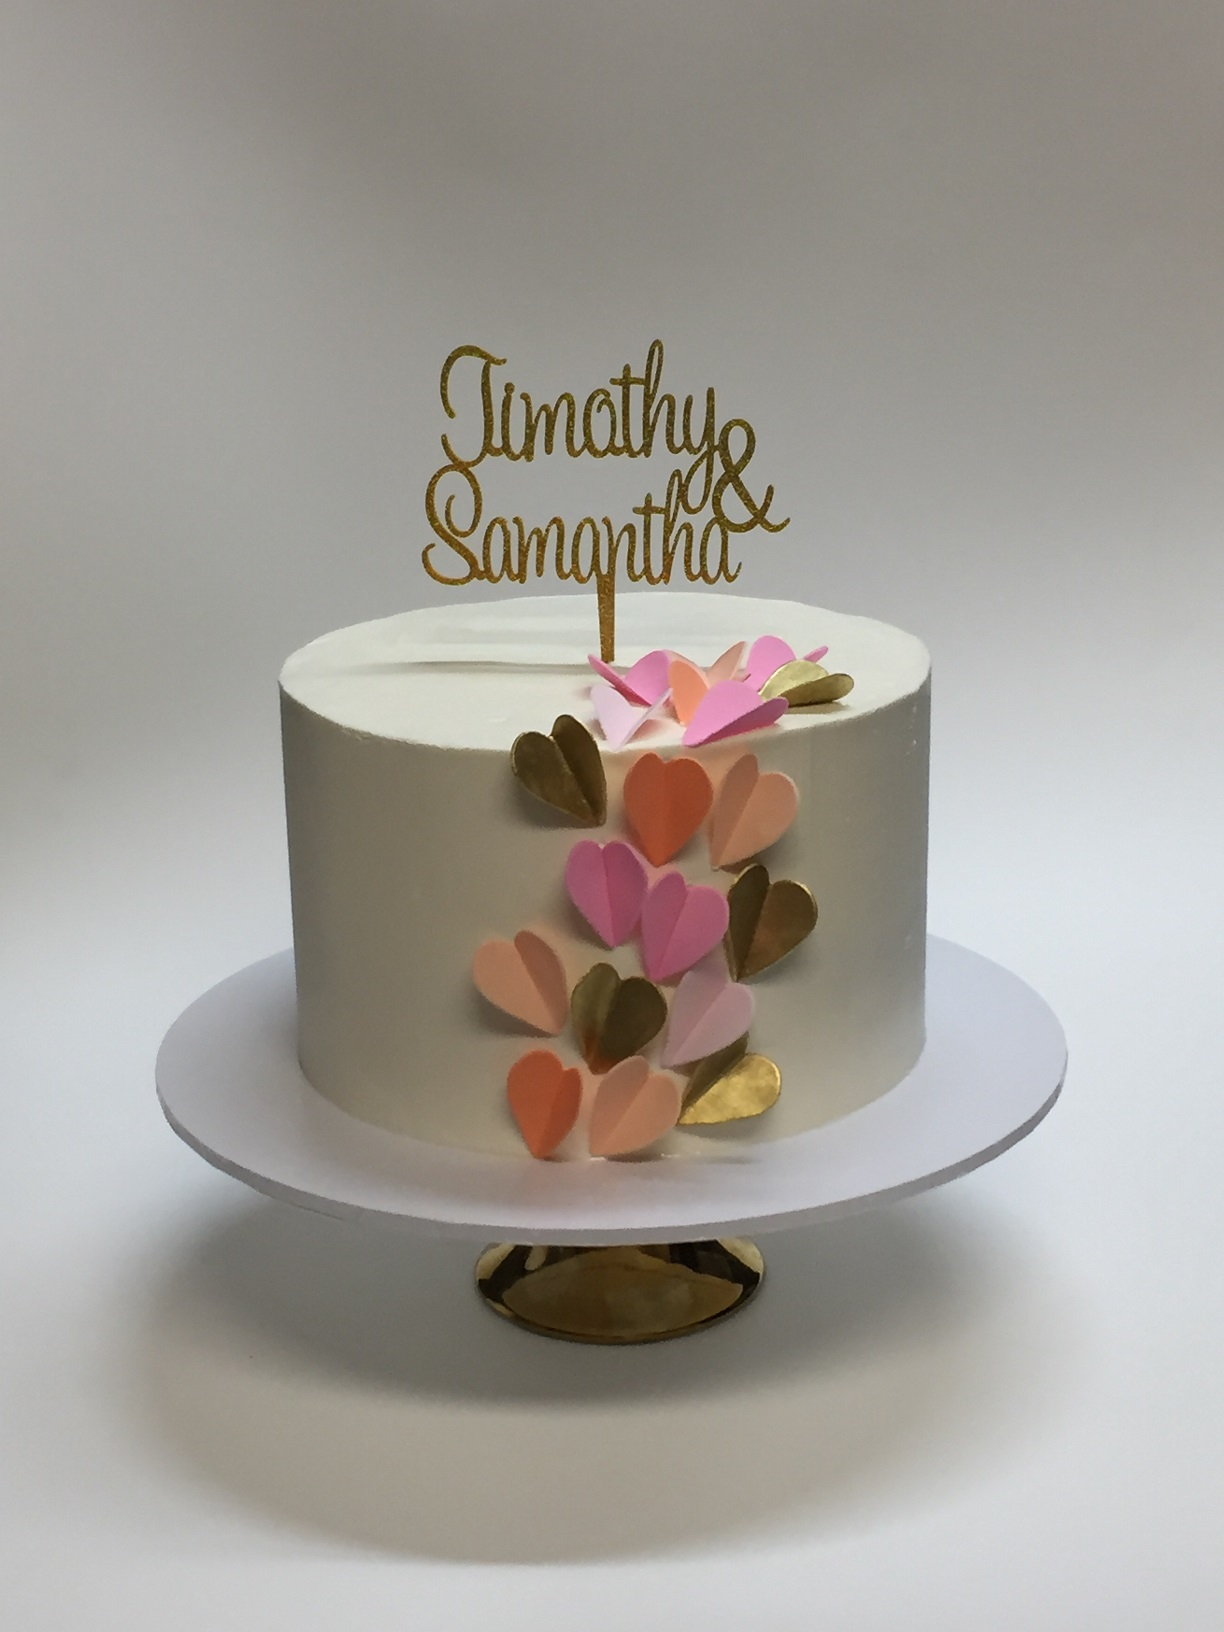 Timothy-Samantha